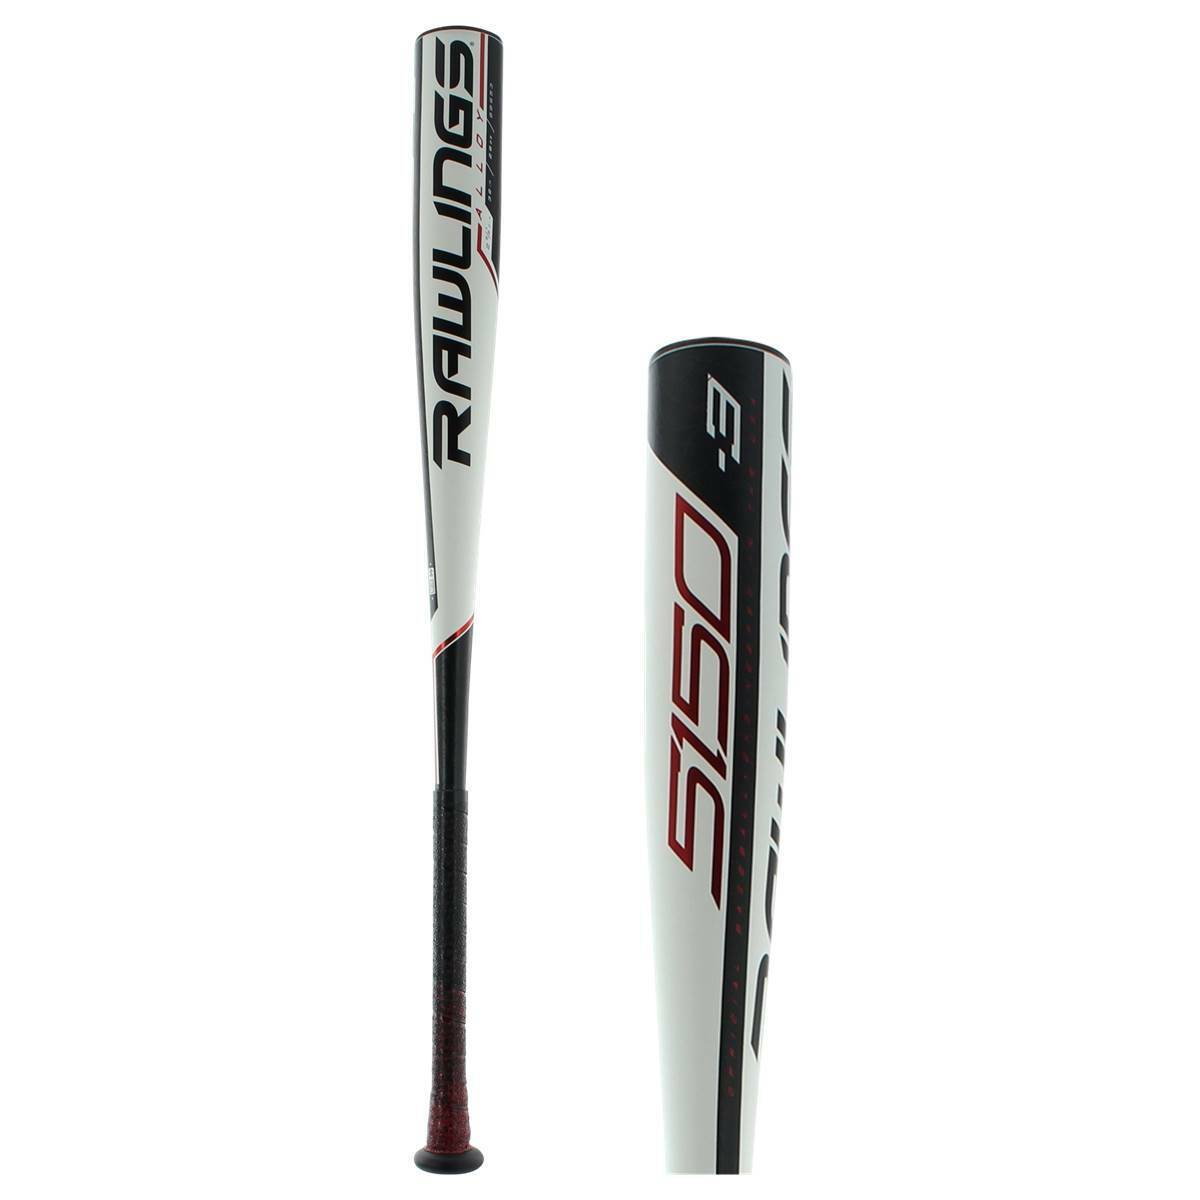 "2017 Rawlings BB75 5150 BBCOR Adult Baseball Bat 31/"" 28 Oz for sale online"